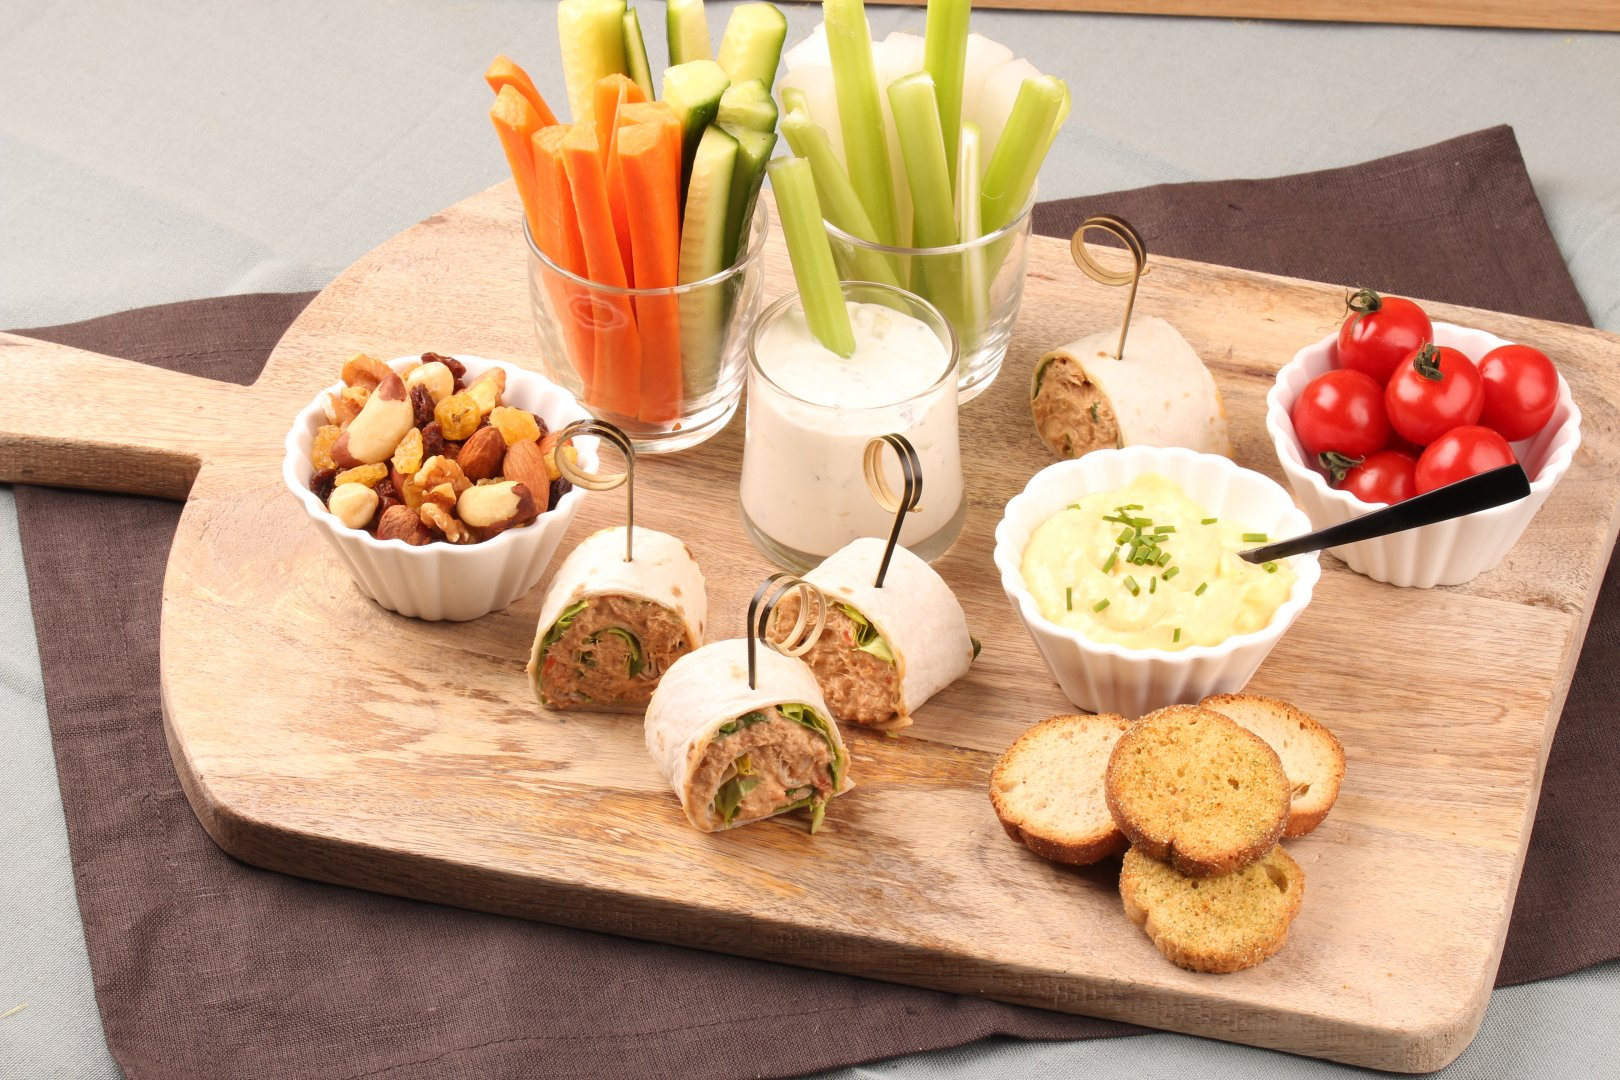 Bieze Food Solutions, Together for good food